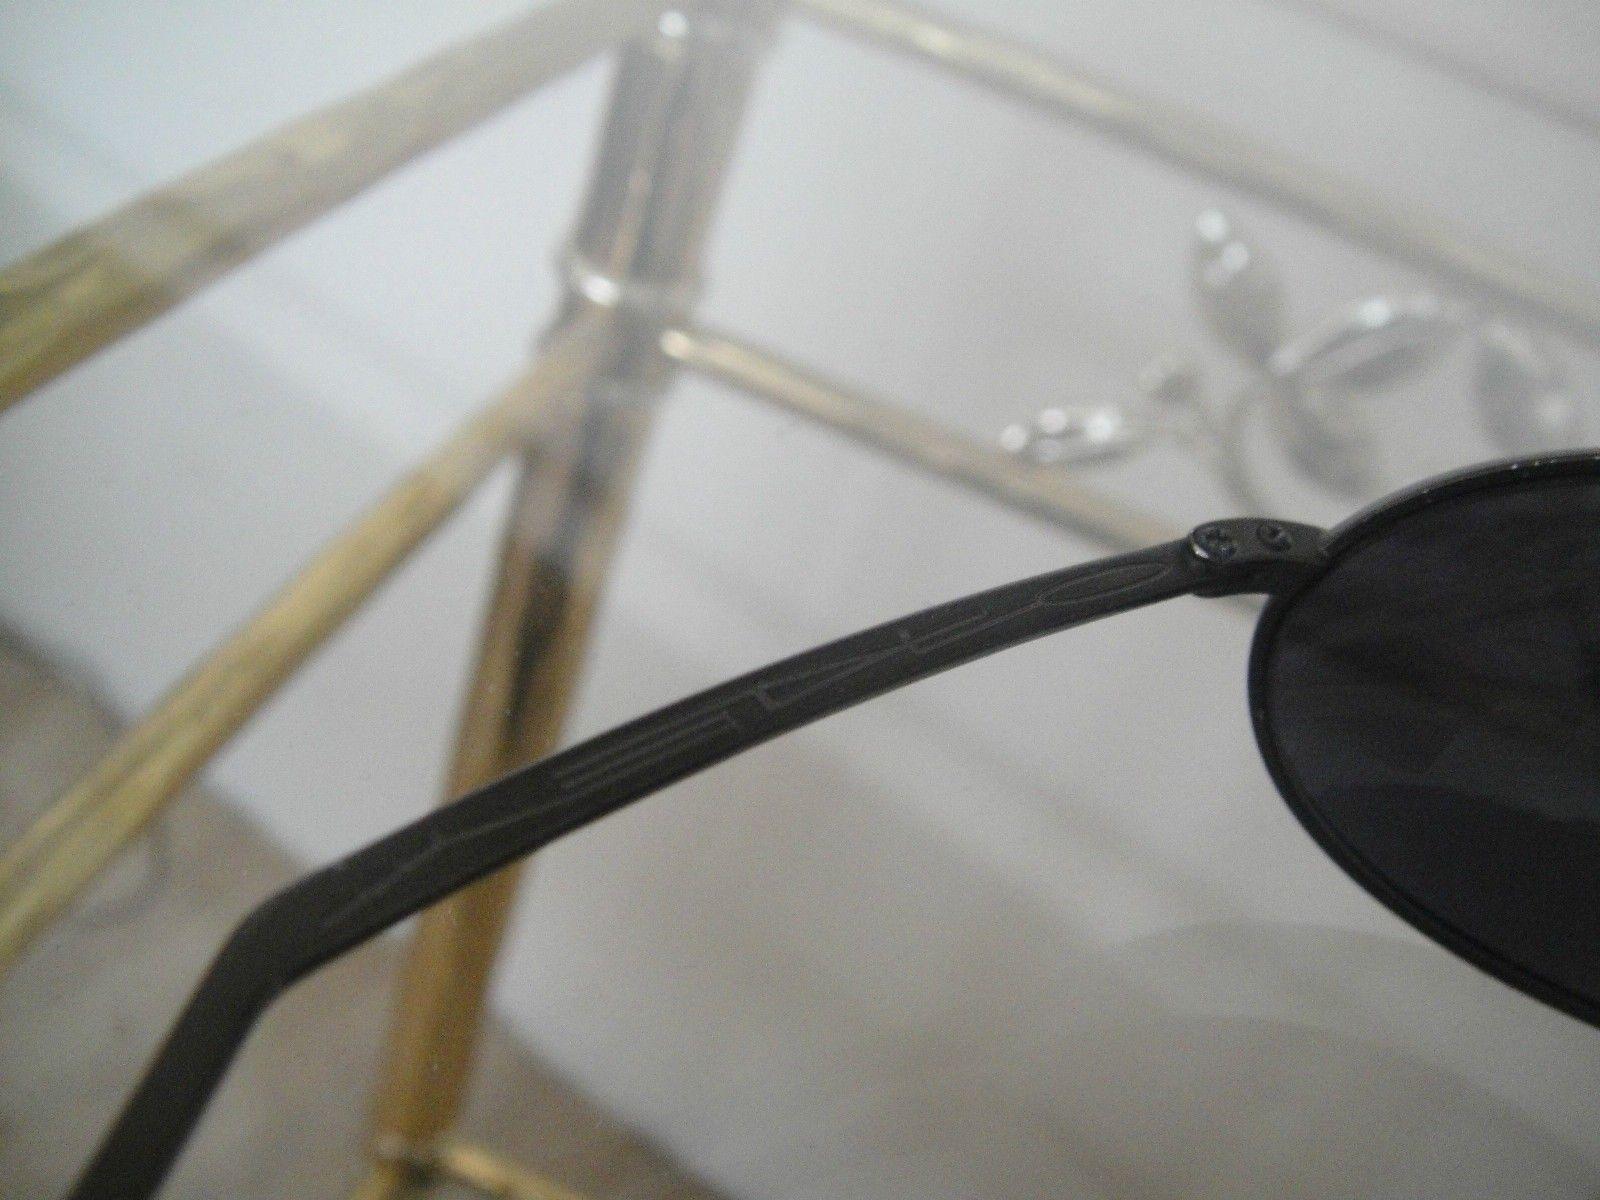 Modern Oakley E Wire 2 1 Motif - Wiring Diagram Ideas - guapodugh.com